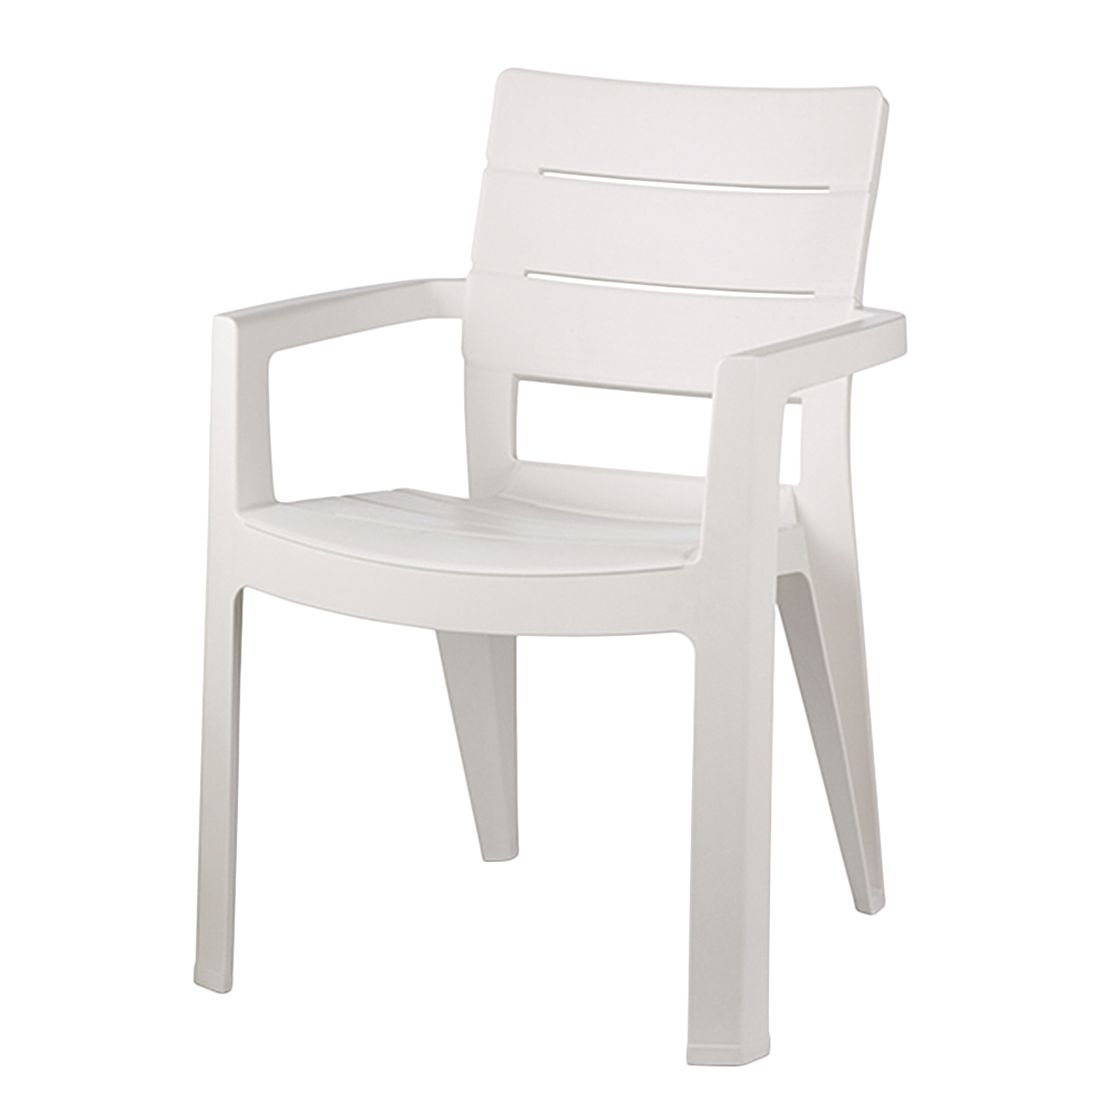 Stapelstuhl Miramar - Kunststoff Weiß, Jardin